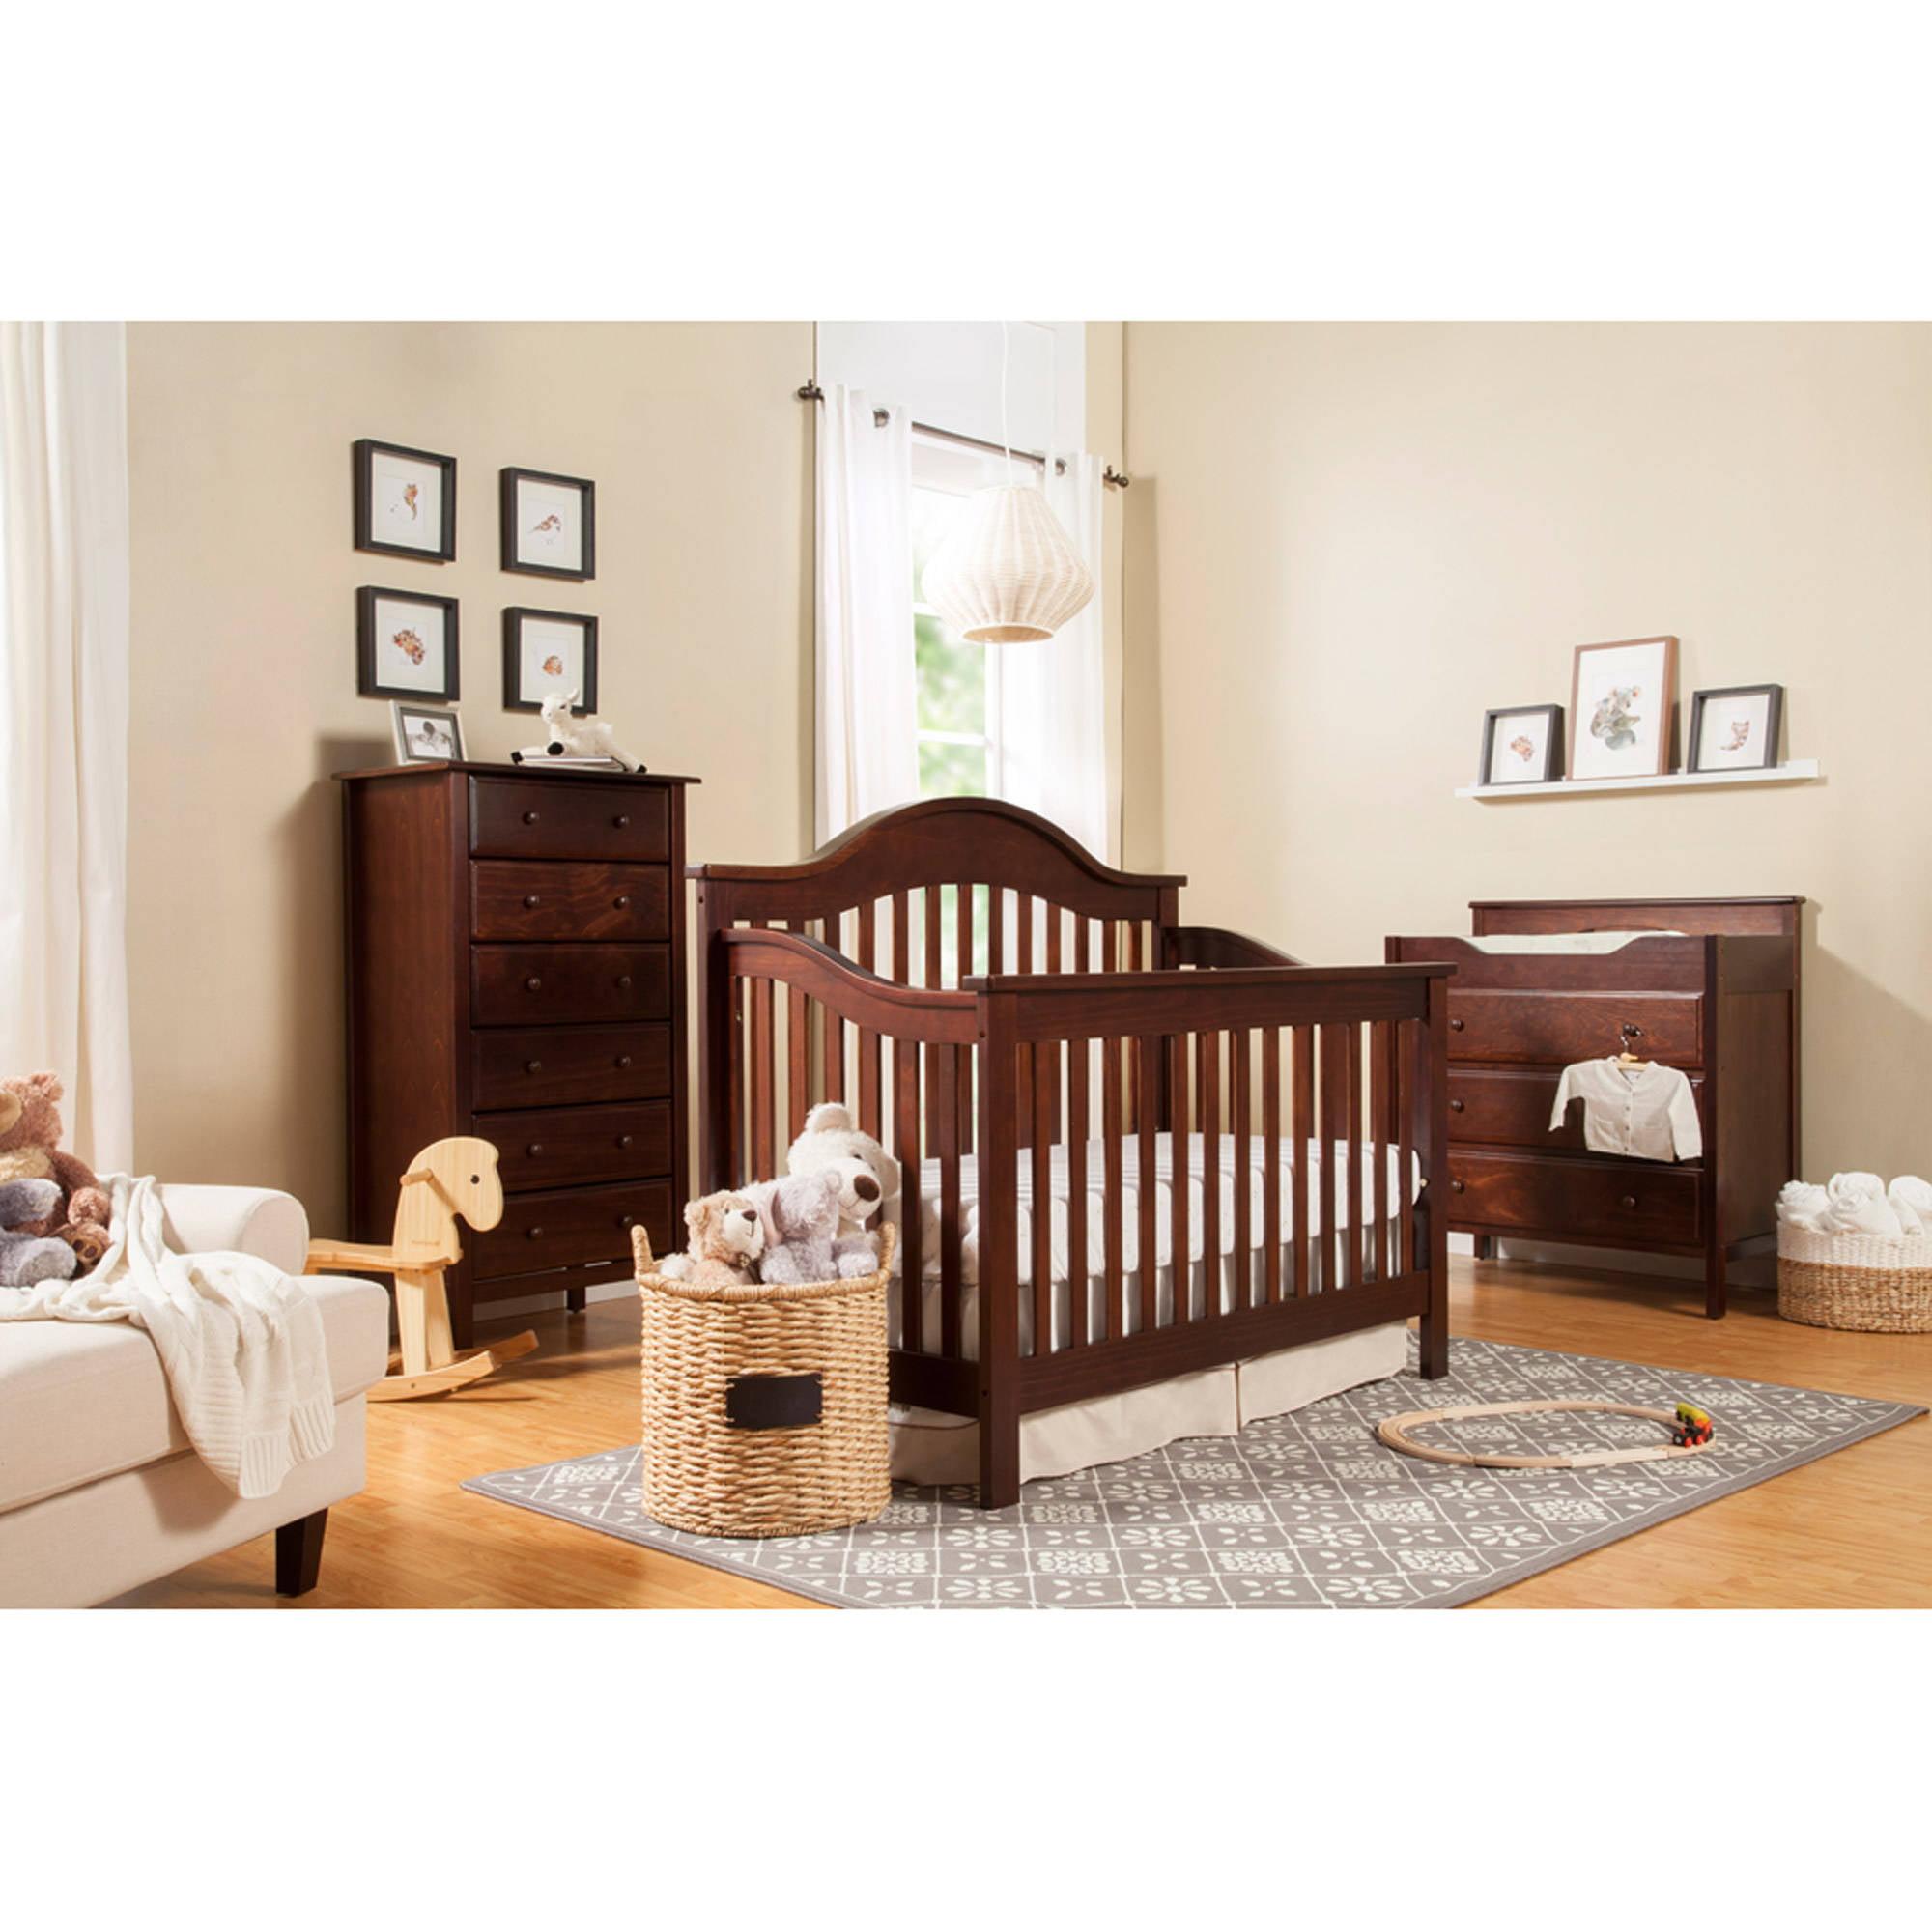 DaVinci Jayden 4-in-1 Convertible Crib with Toddler Rail, Espresso